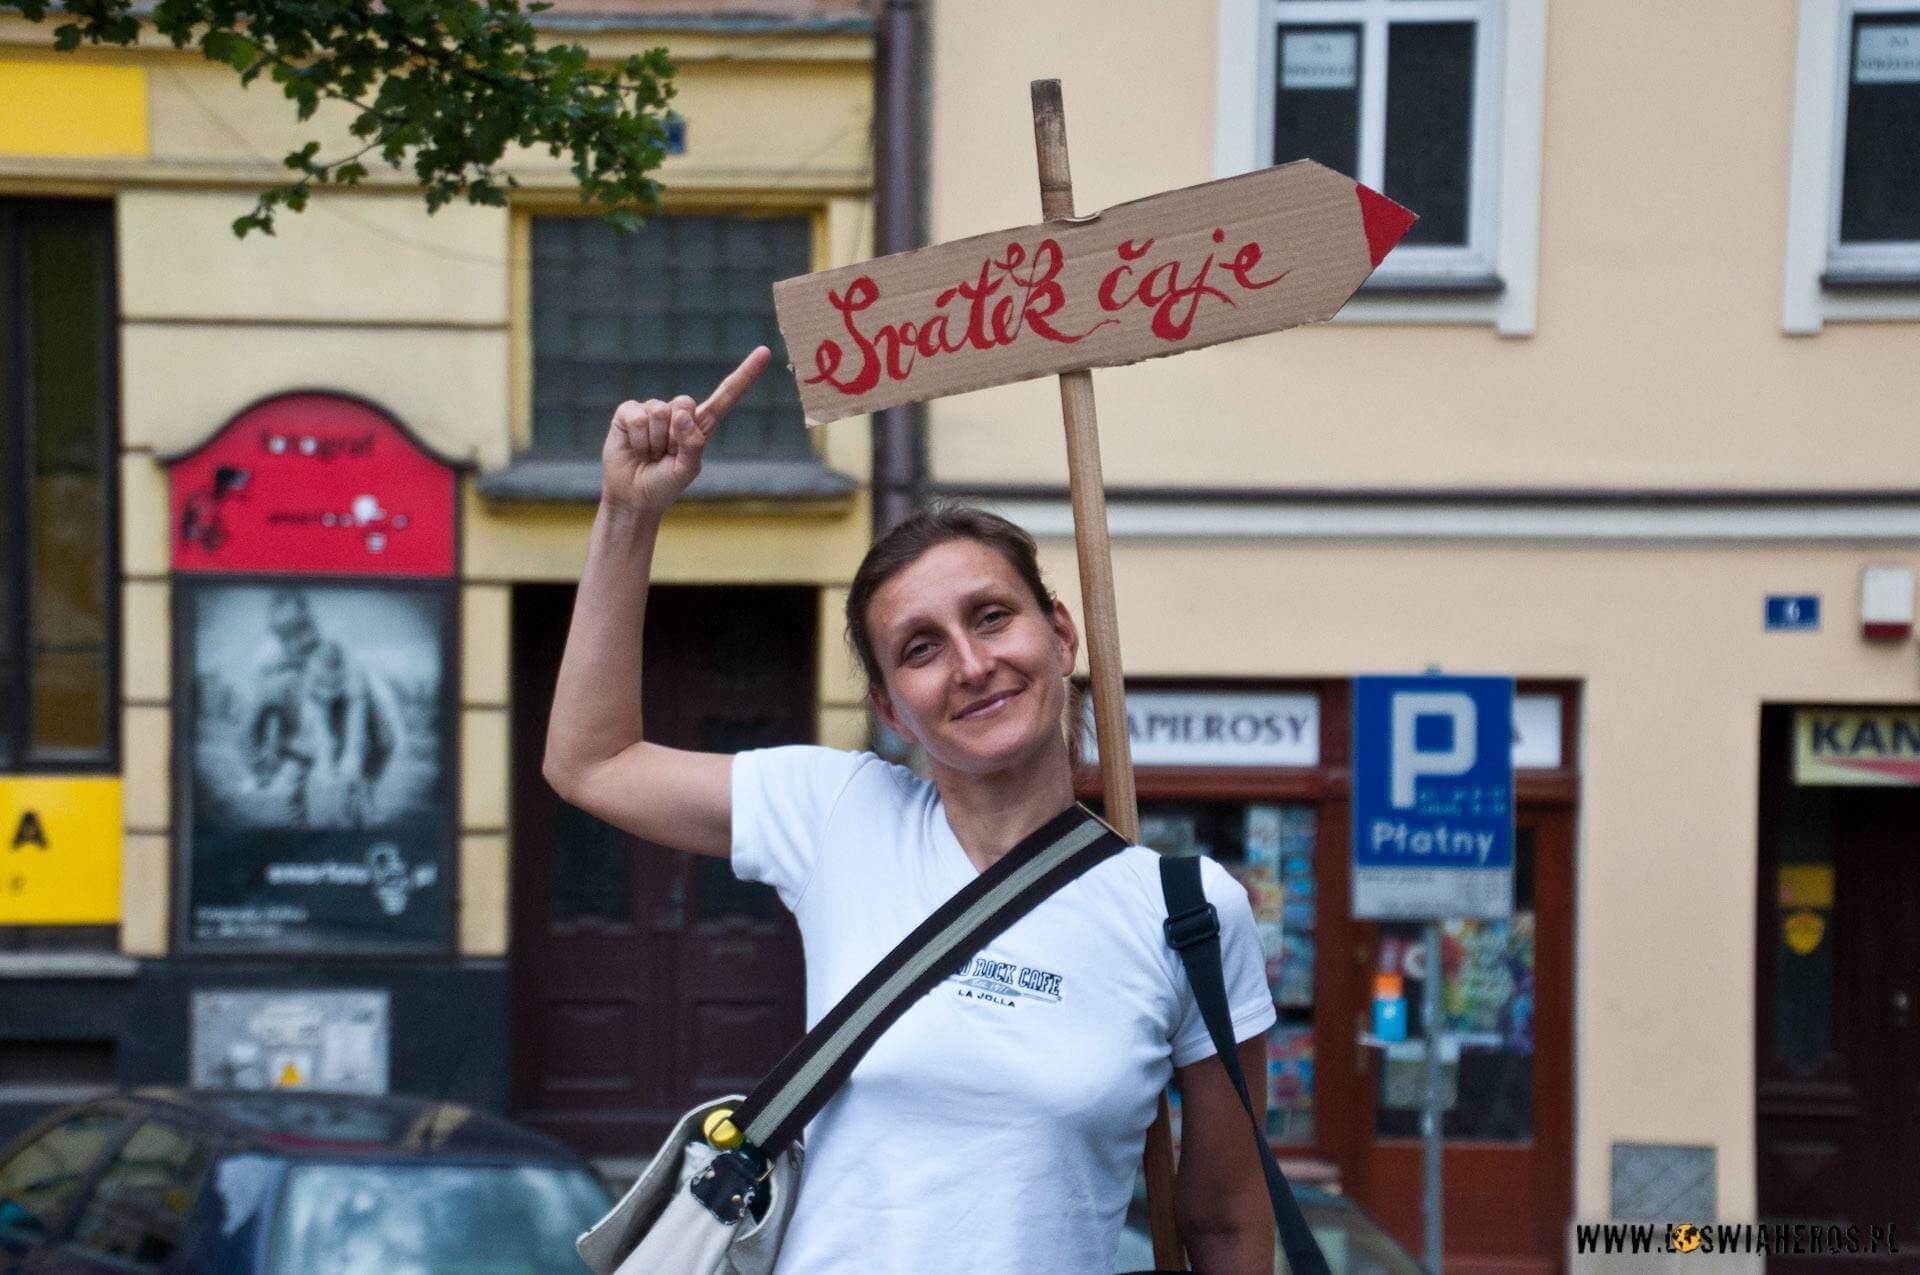 Święto Herbaty 2014, Cieszyn [f/5, 58mm]